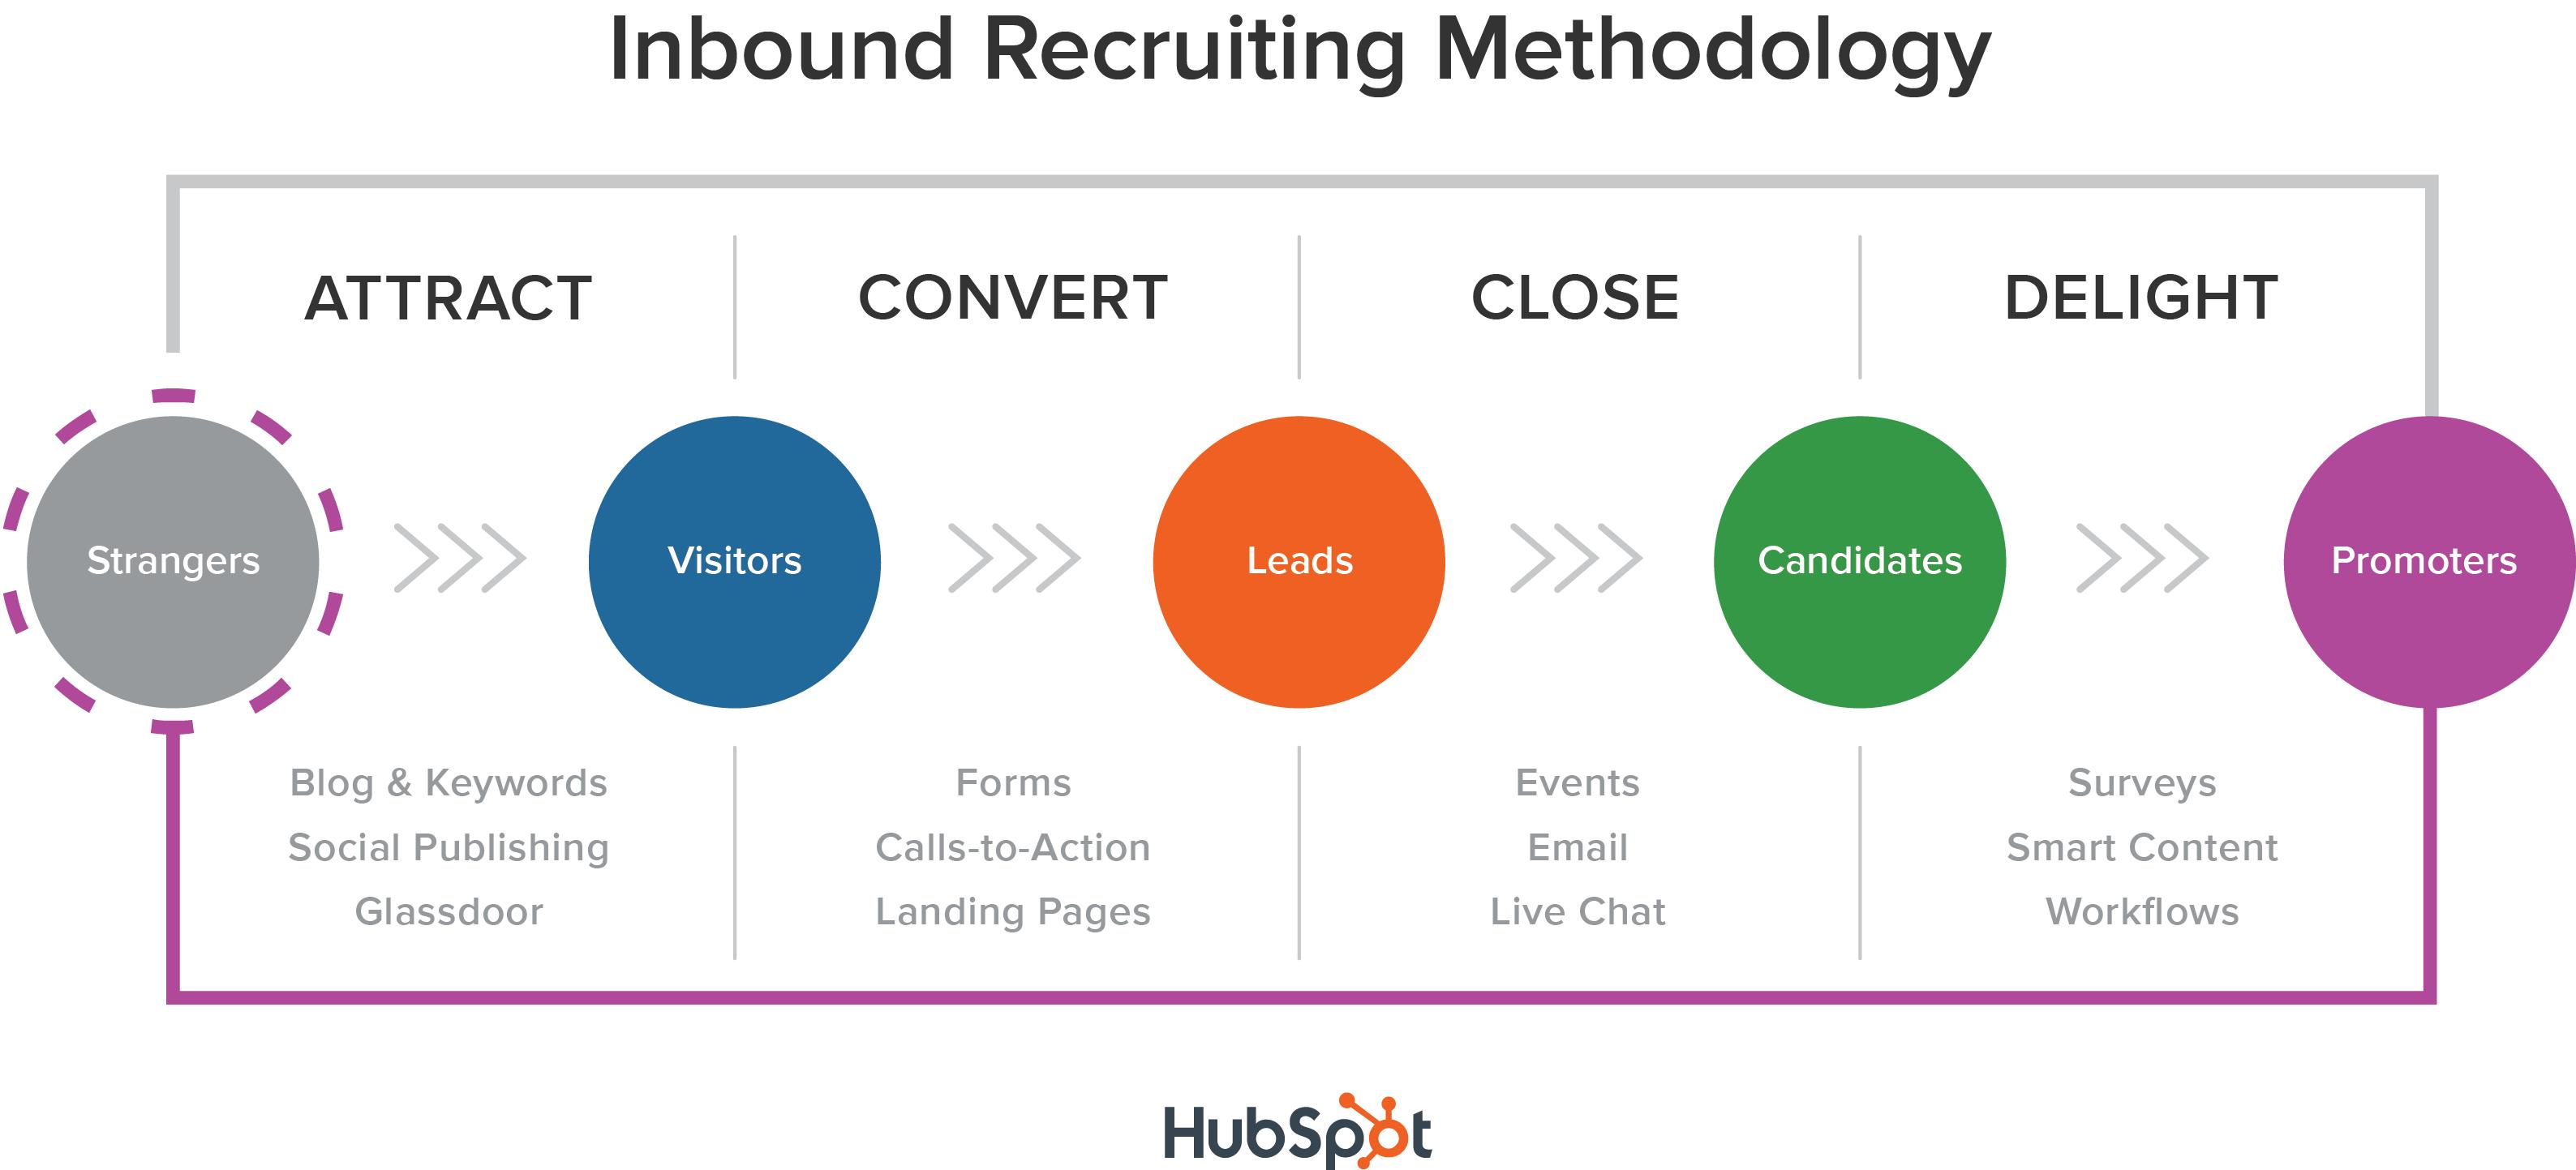 inbound_recruiting_methodology.png